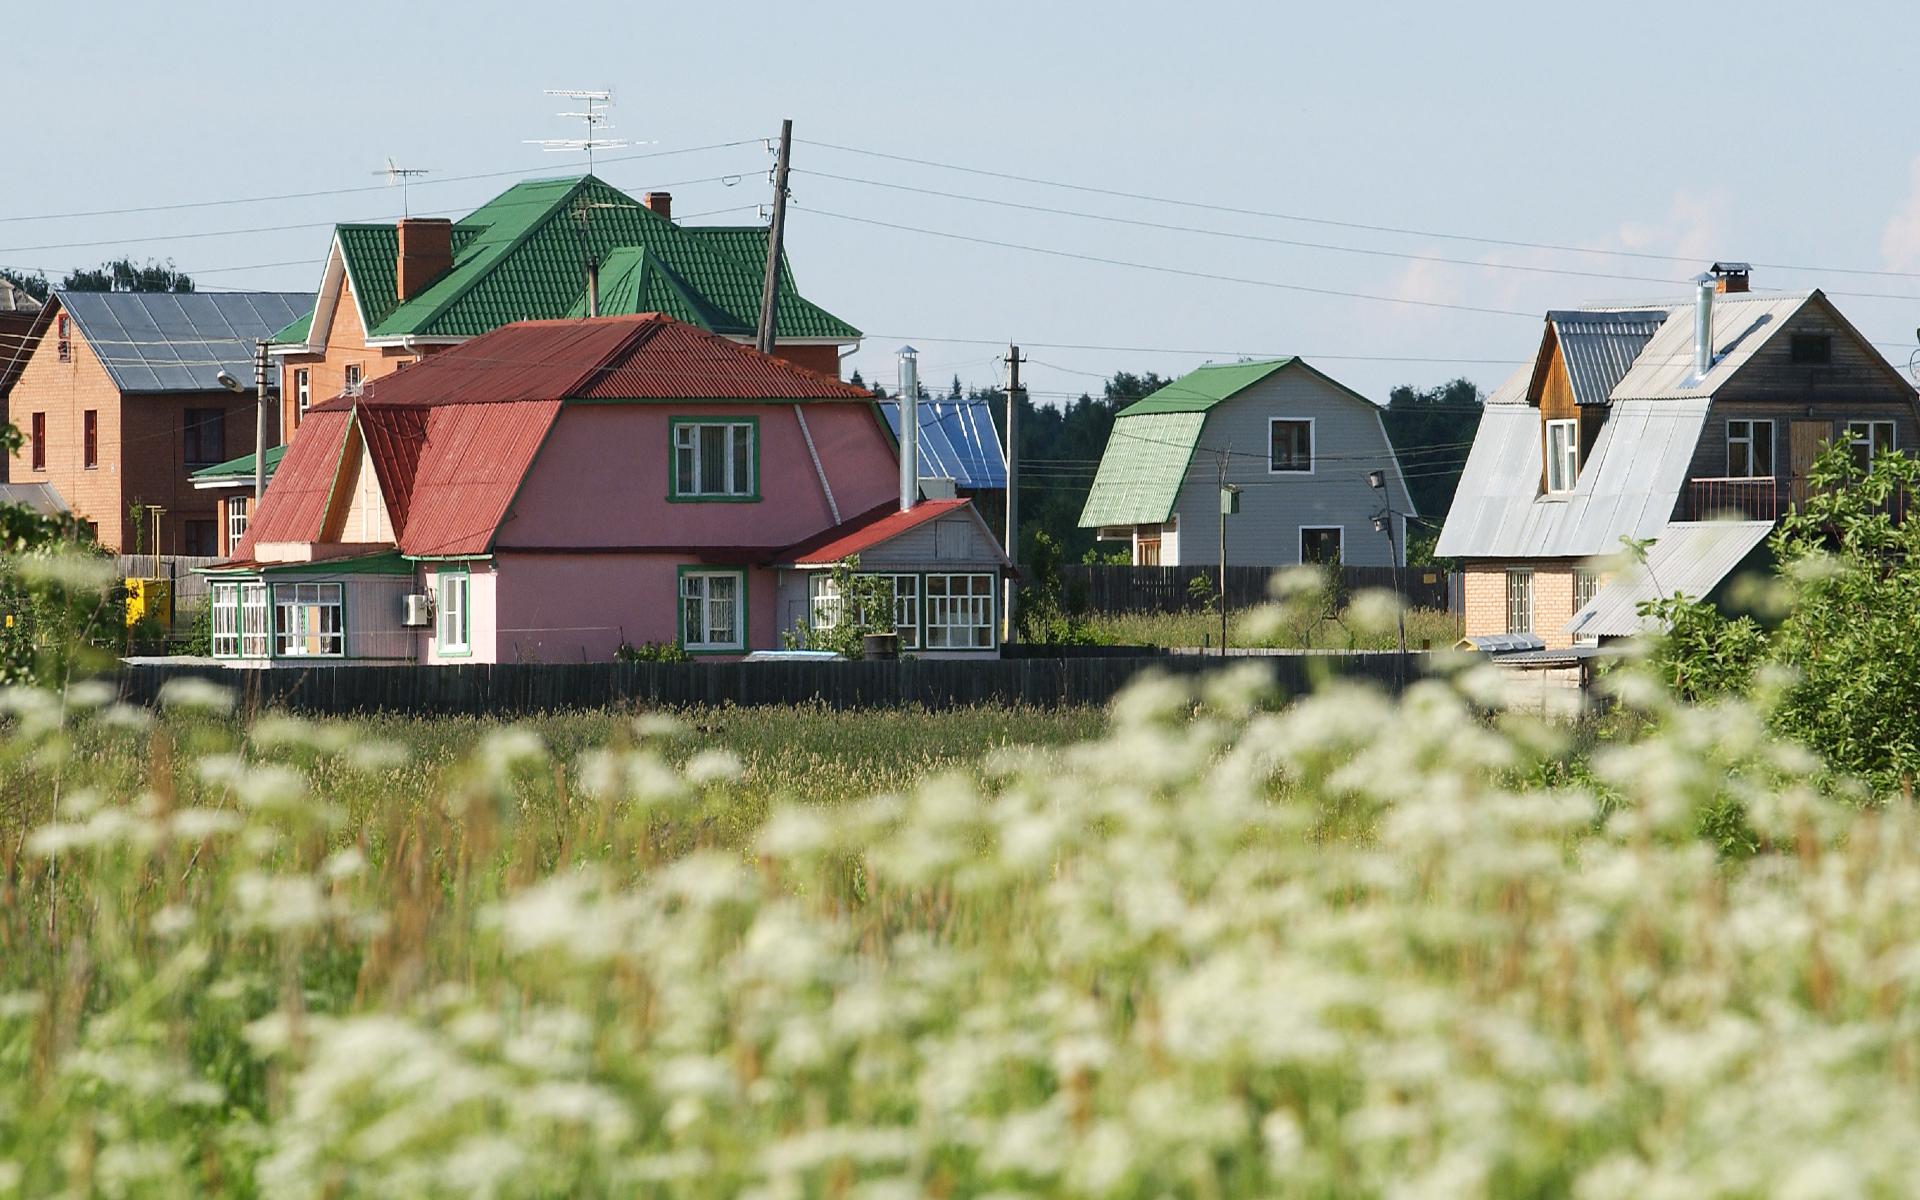 Фото: Борис Кавашкин/ИТАР-ТАСС